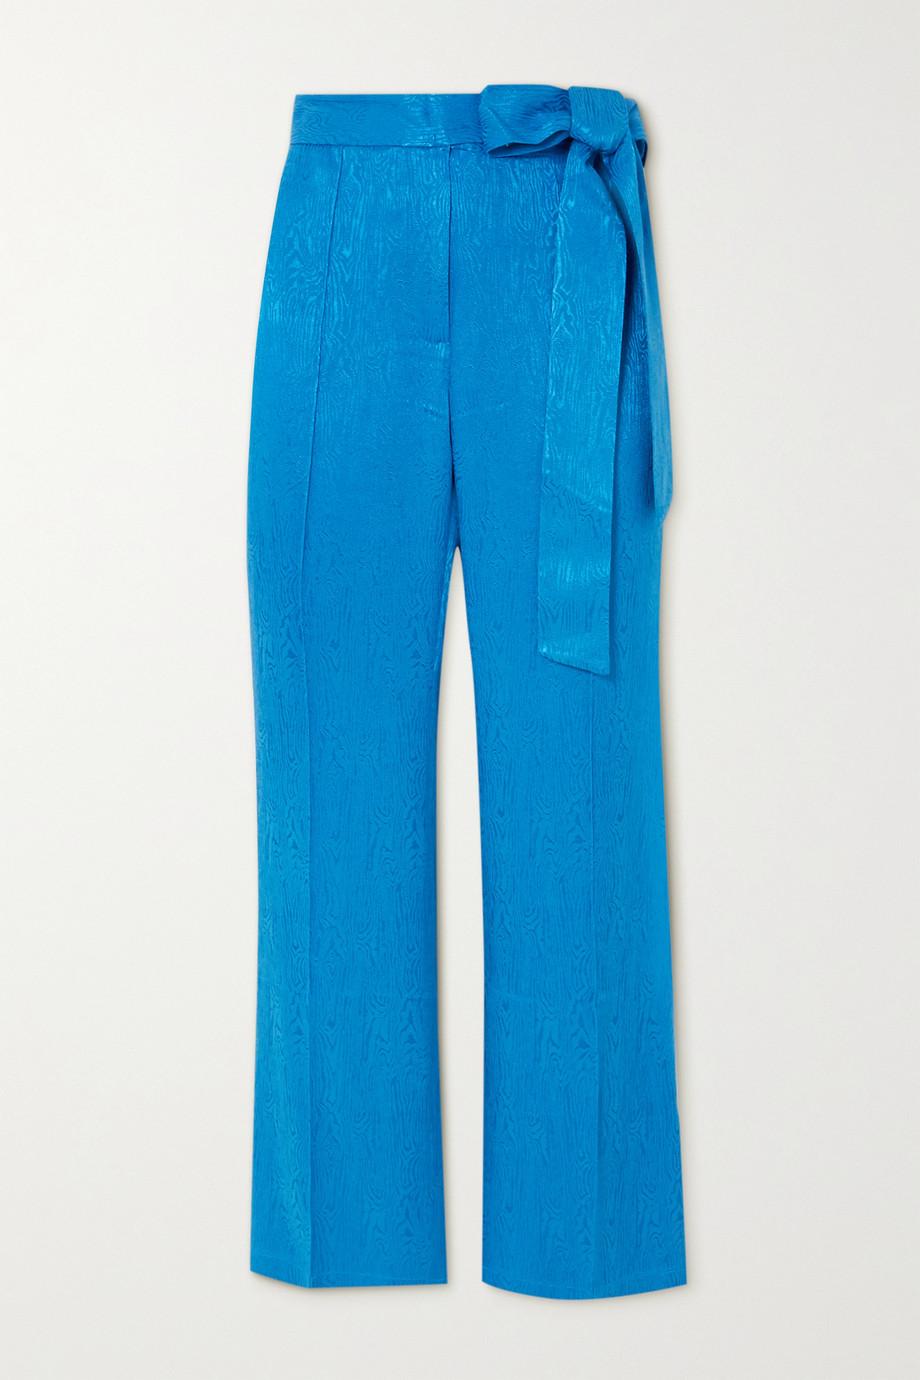 USISI SISTER Jenna cropped bow-detailed jacquard slim-leg pants